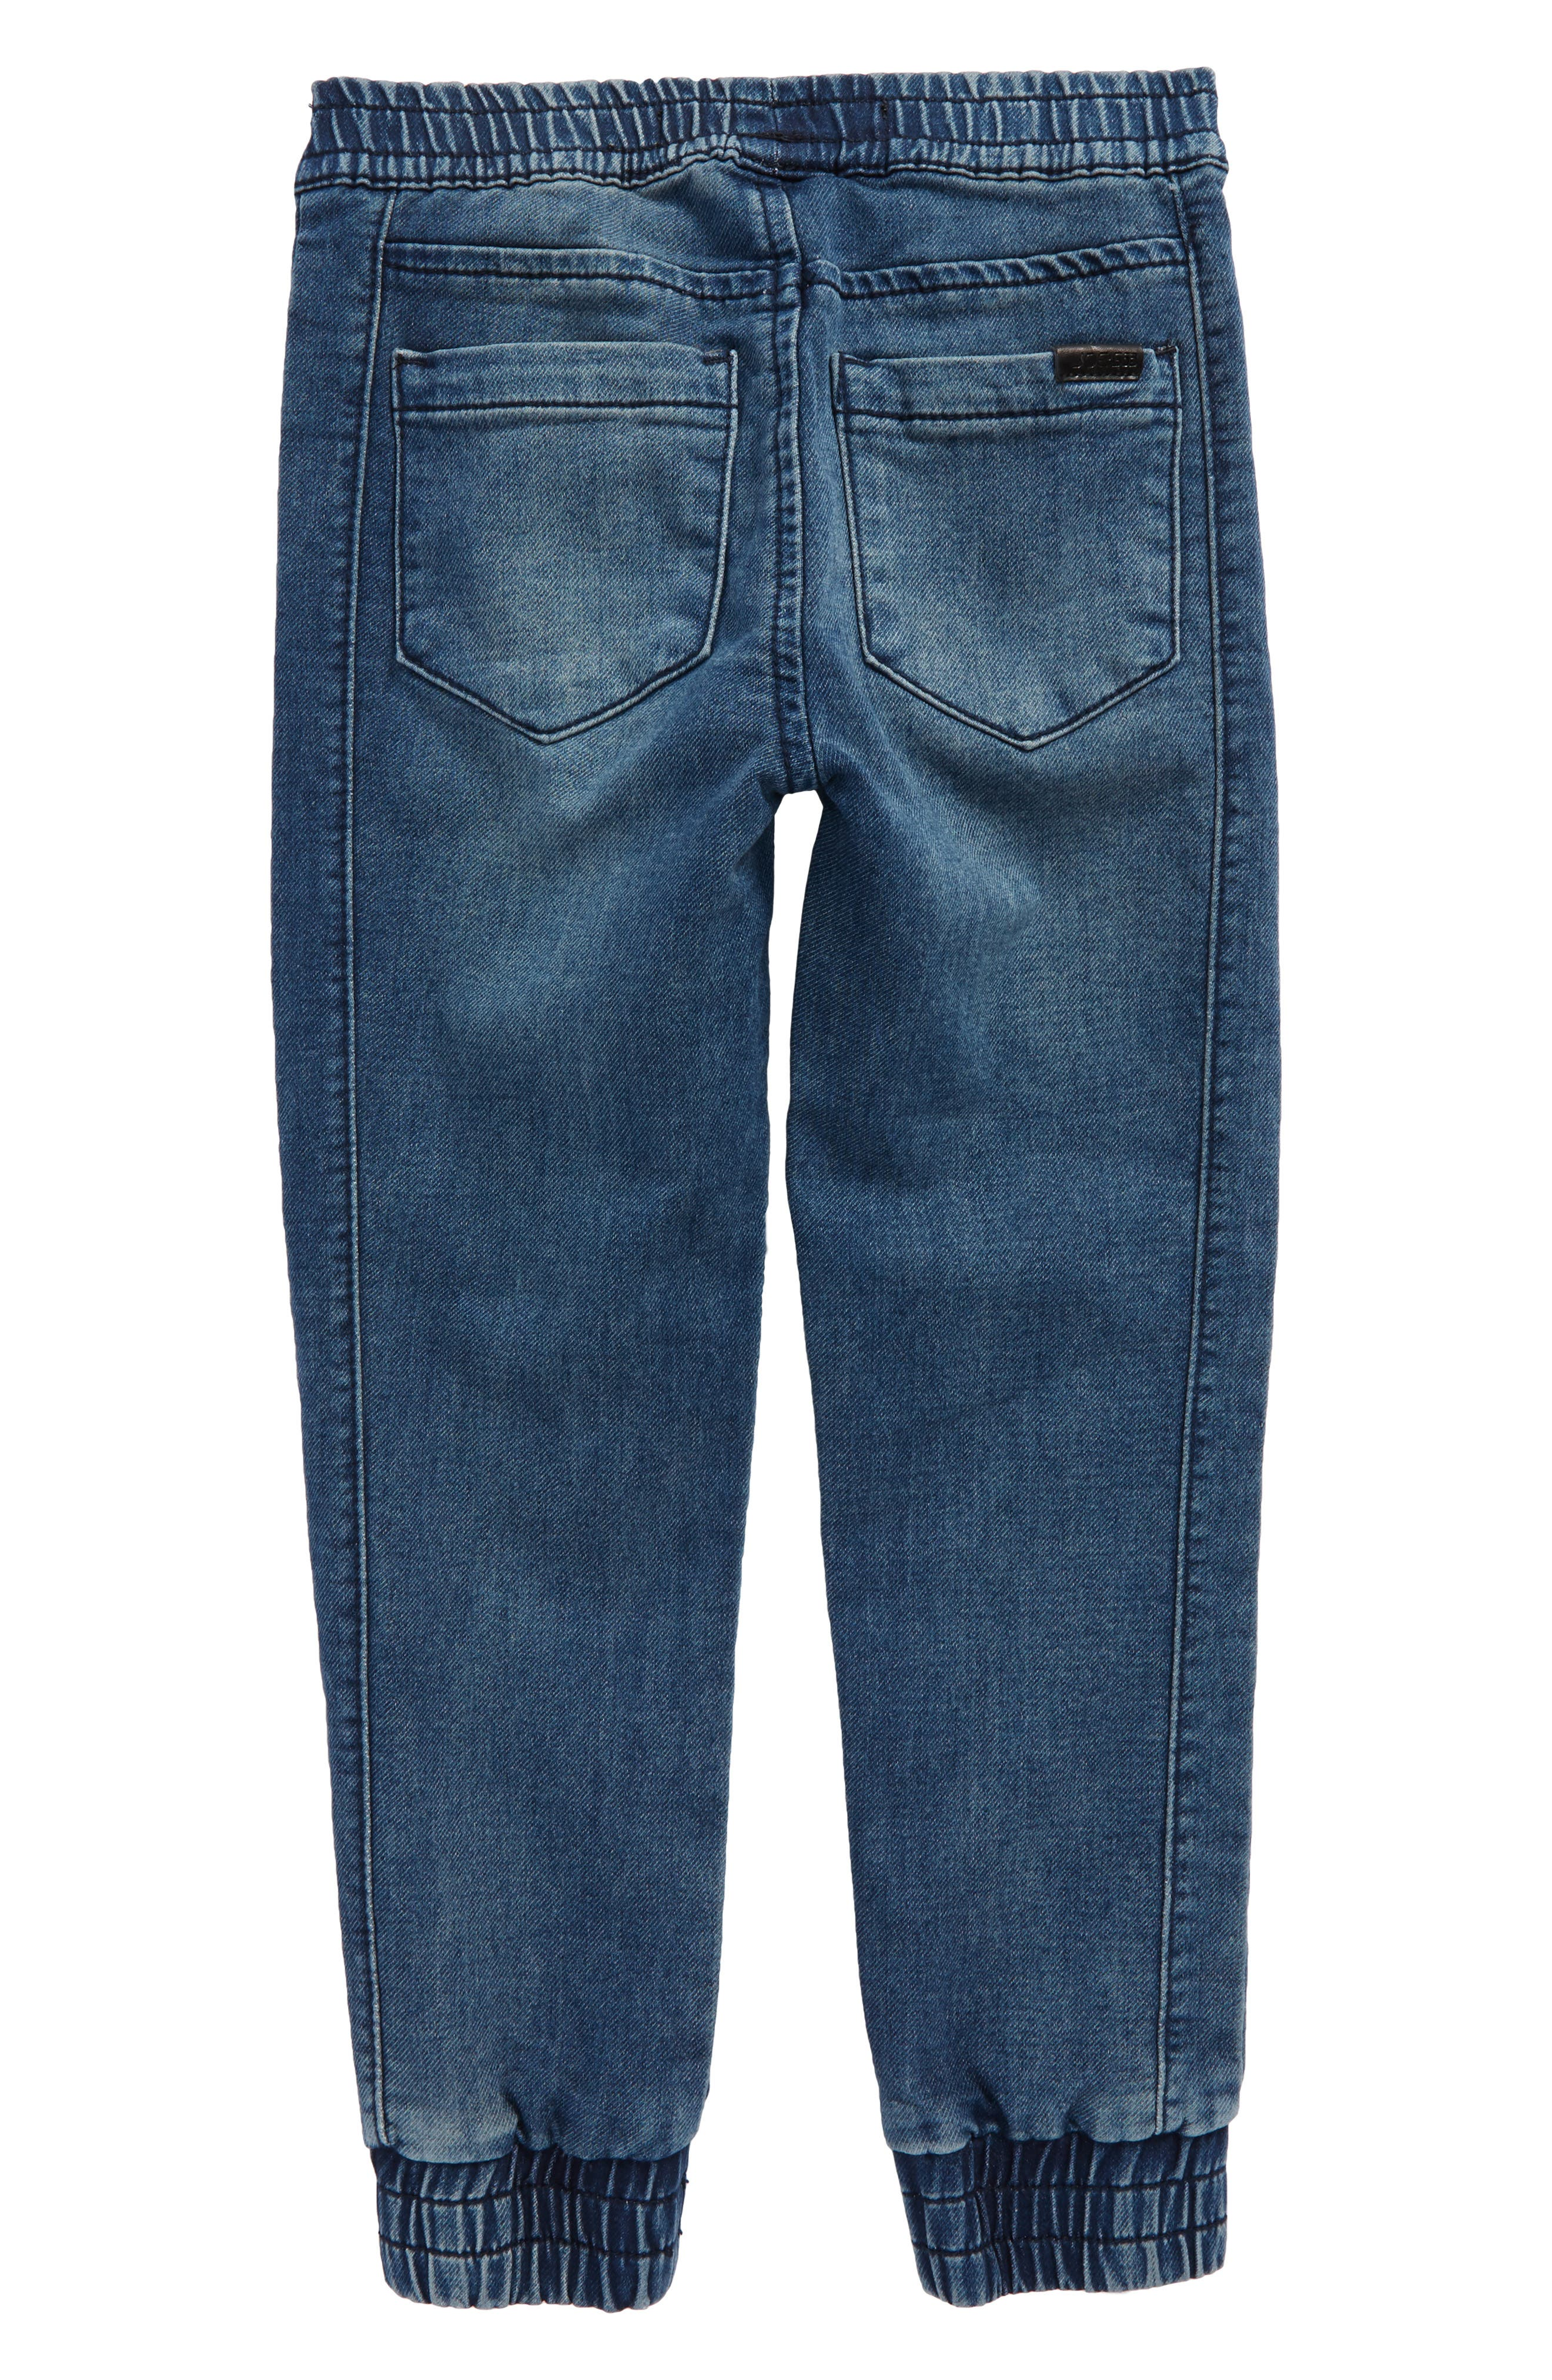 Slim Fit Denim Jogger Pants,                             Alternate thumbnail 2, color,                             Indigo